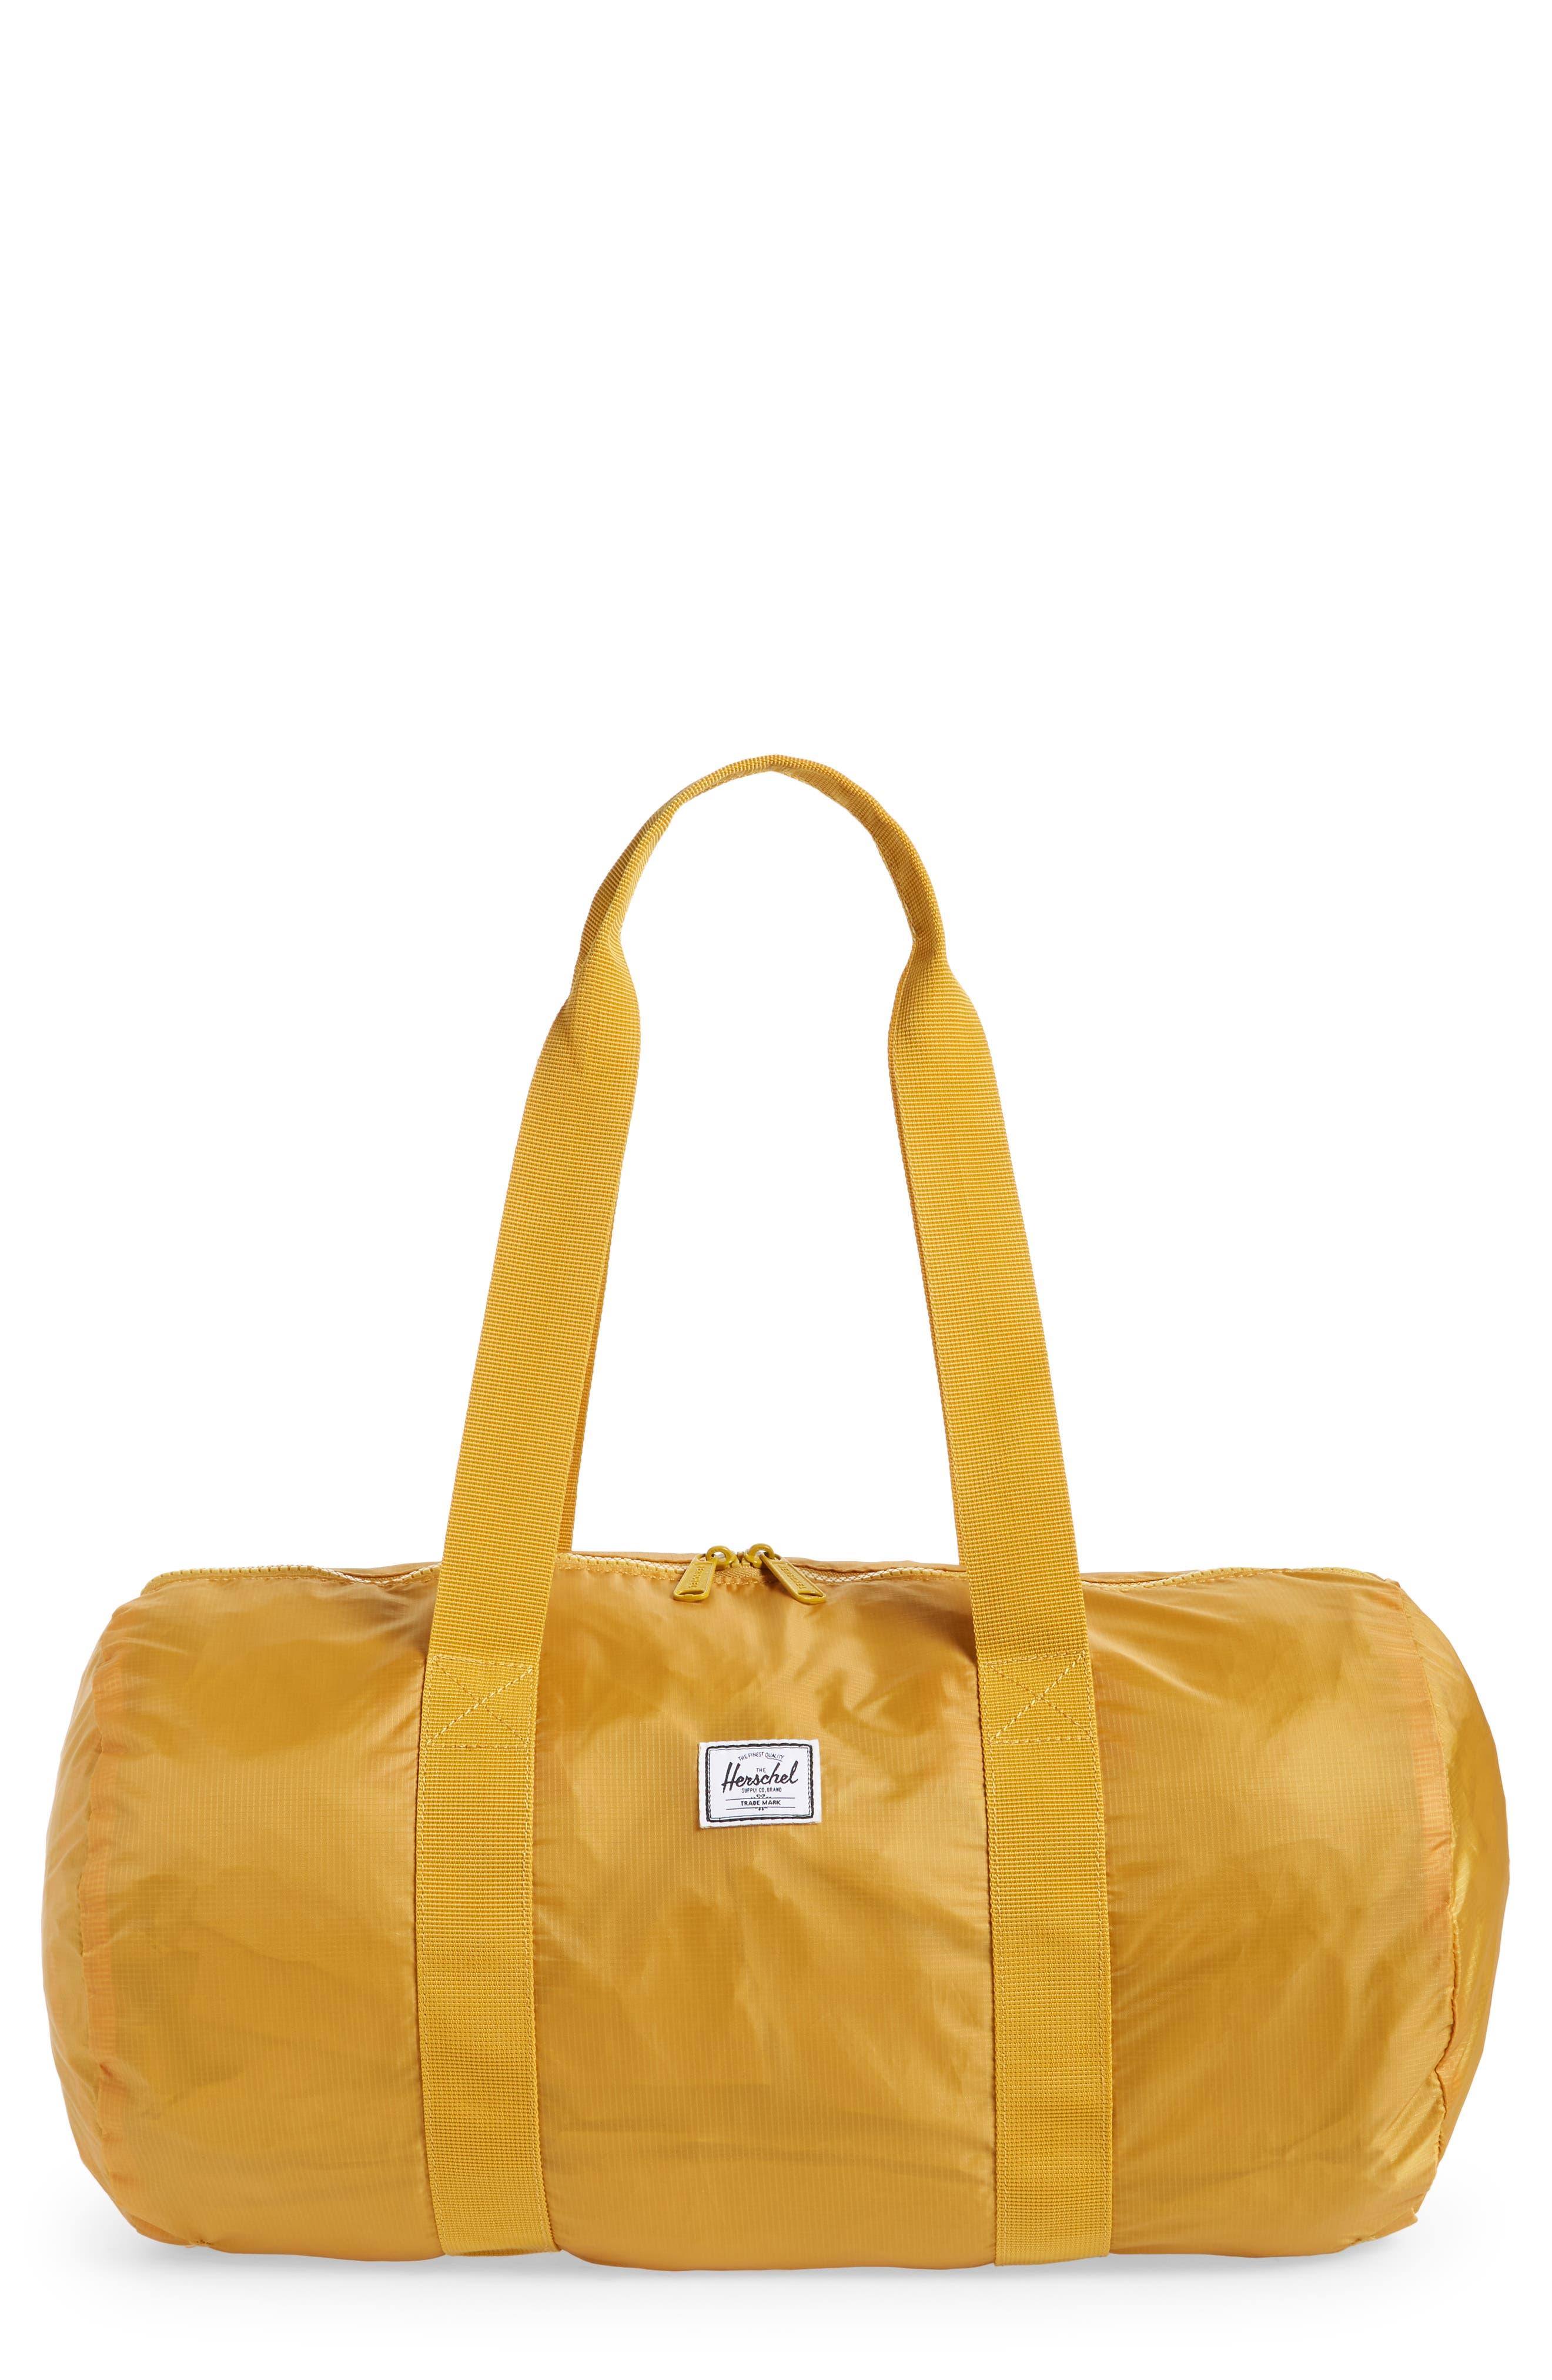 Packable Convertible Duffle Bag